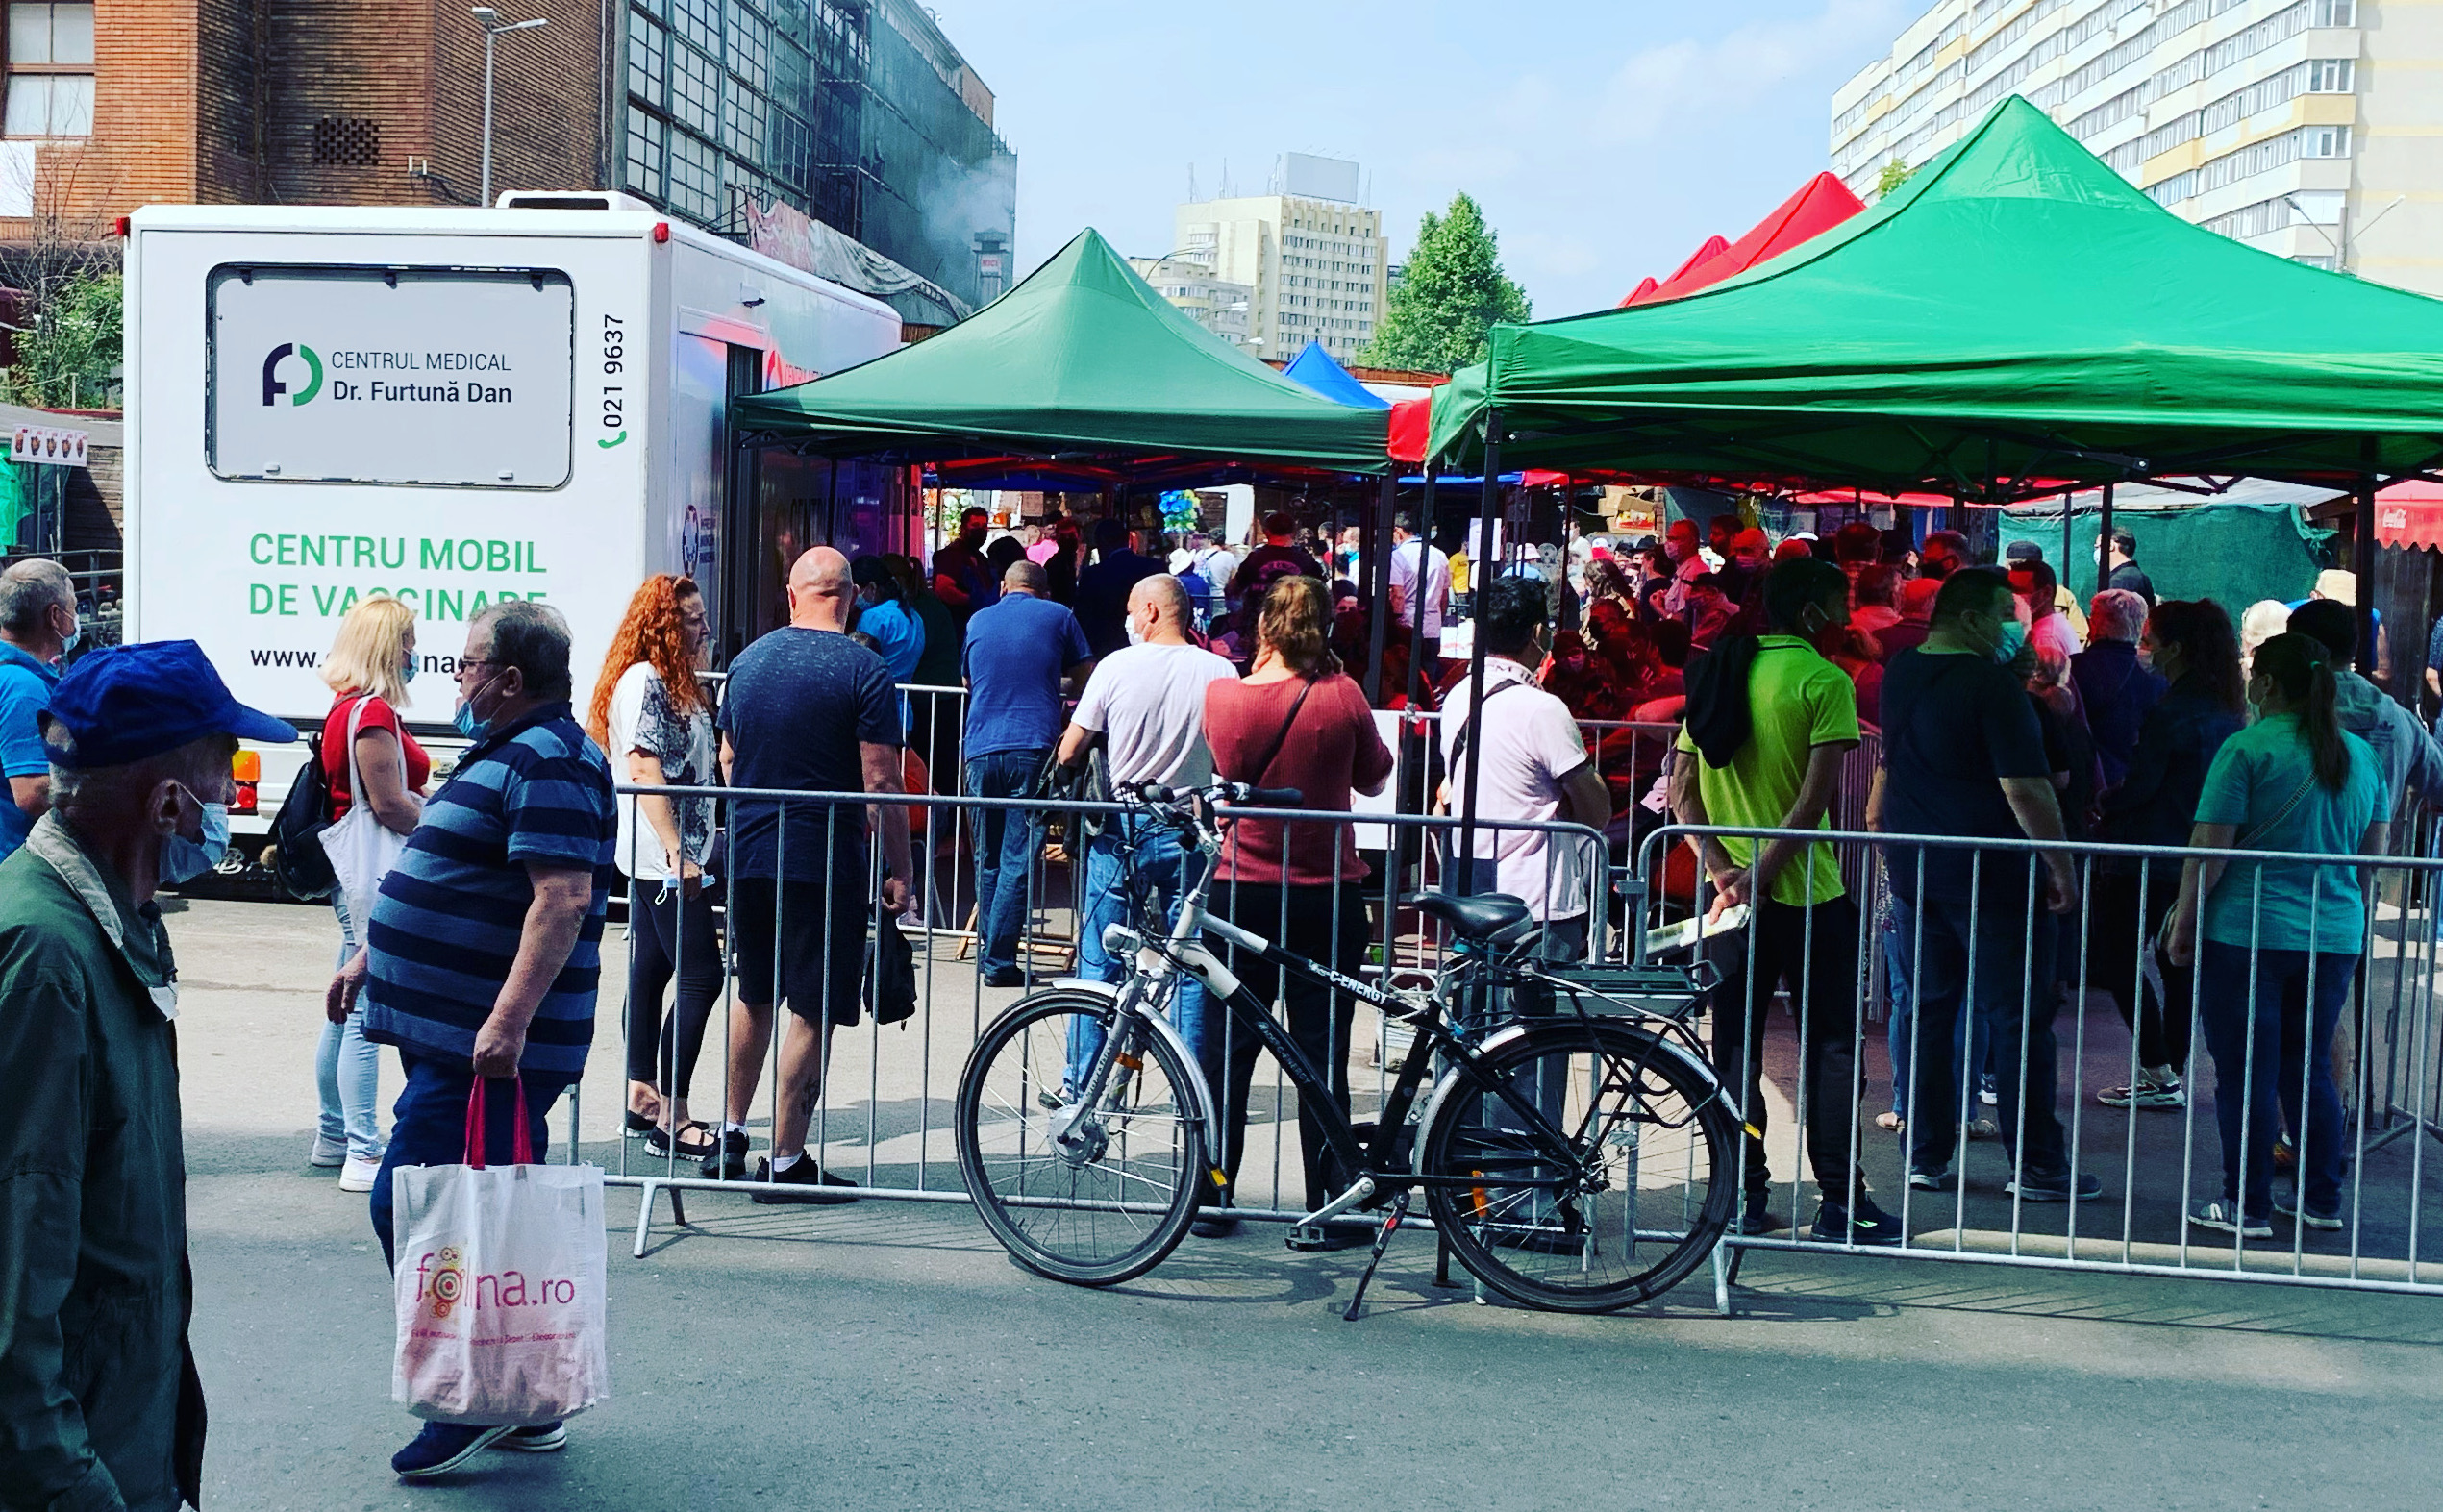 Queuing for vaccines in Bucharest's Obor market